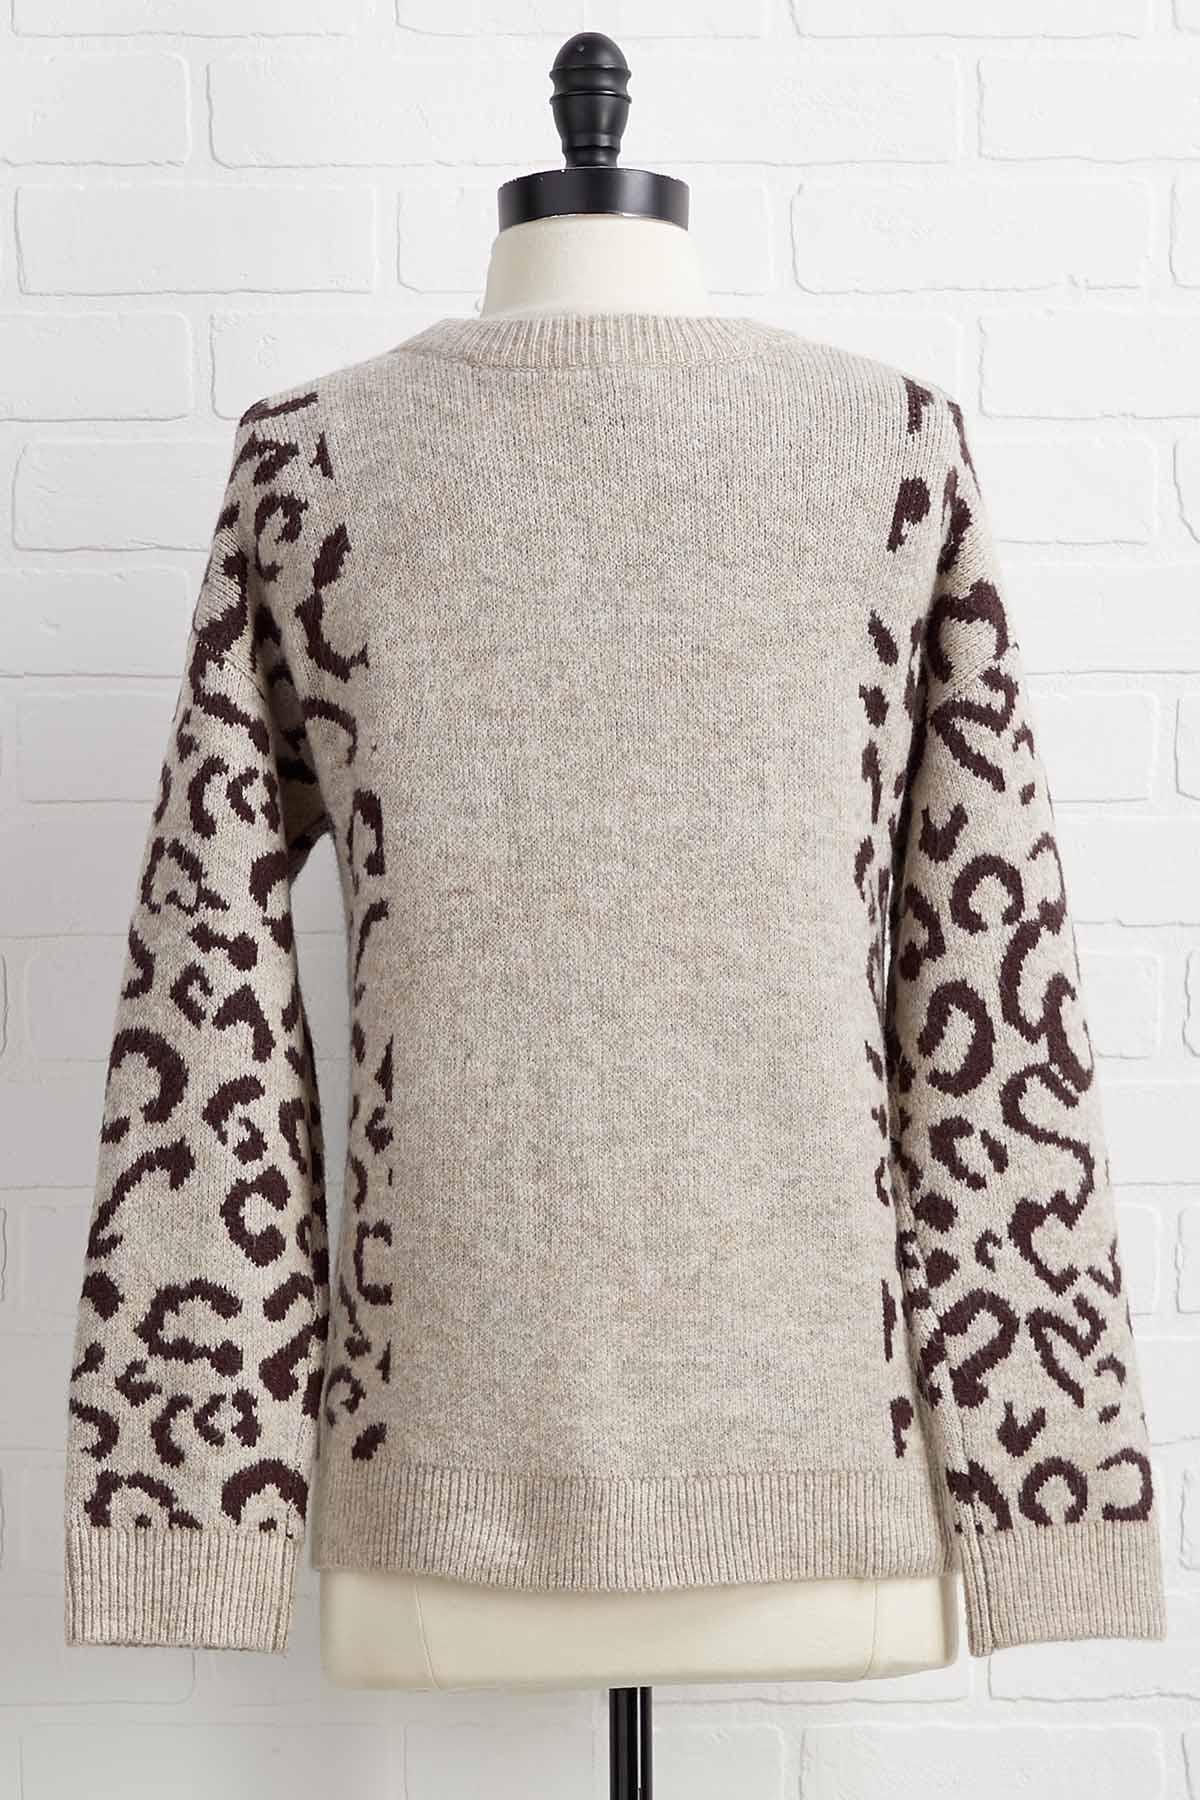 A Wildly Warm Sweater